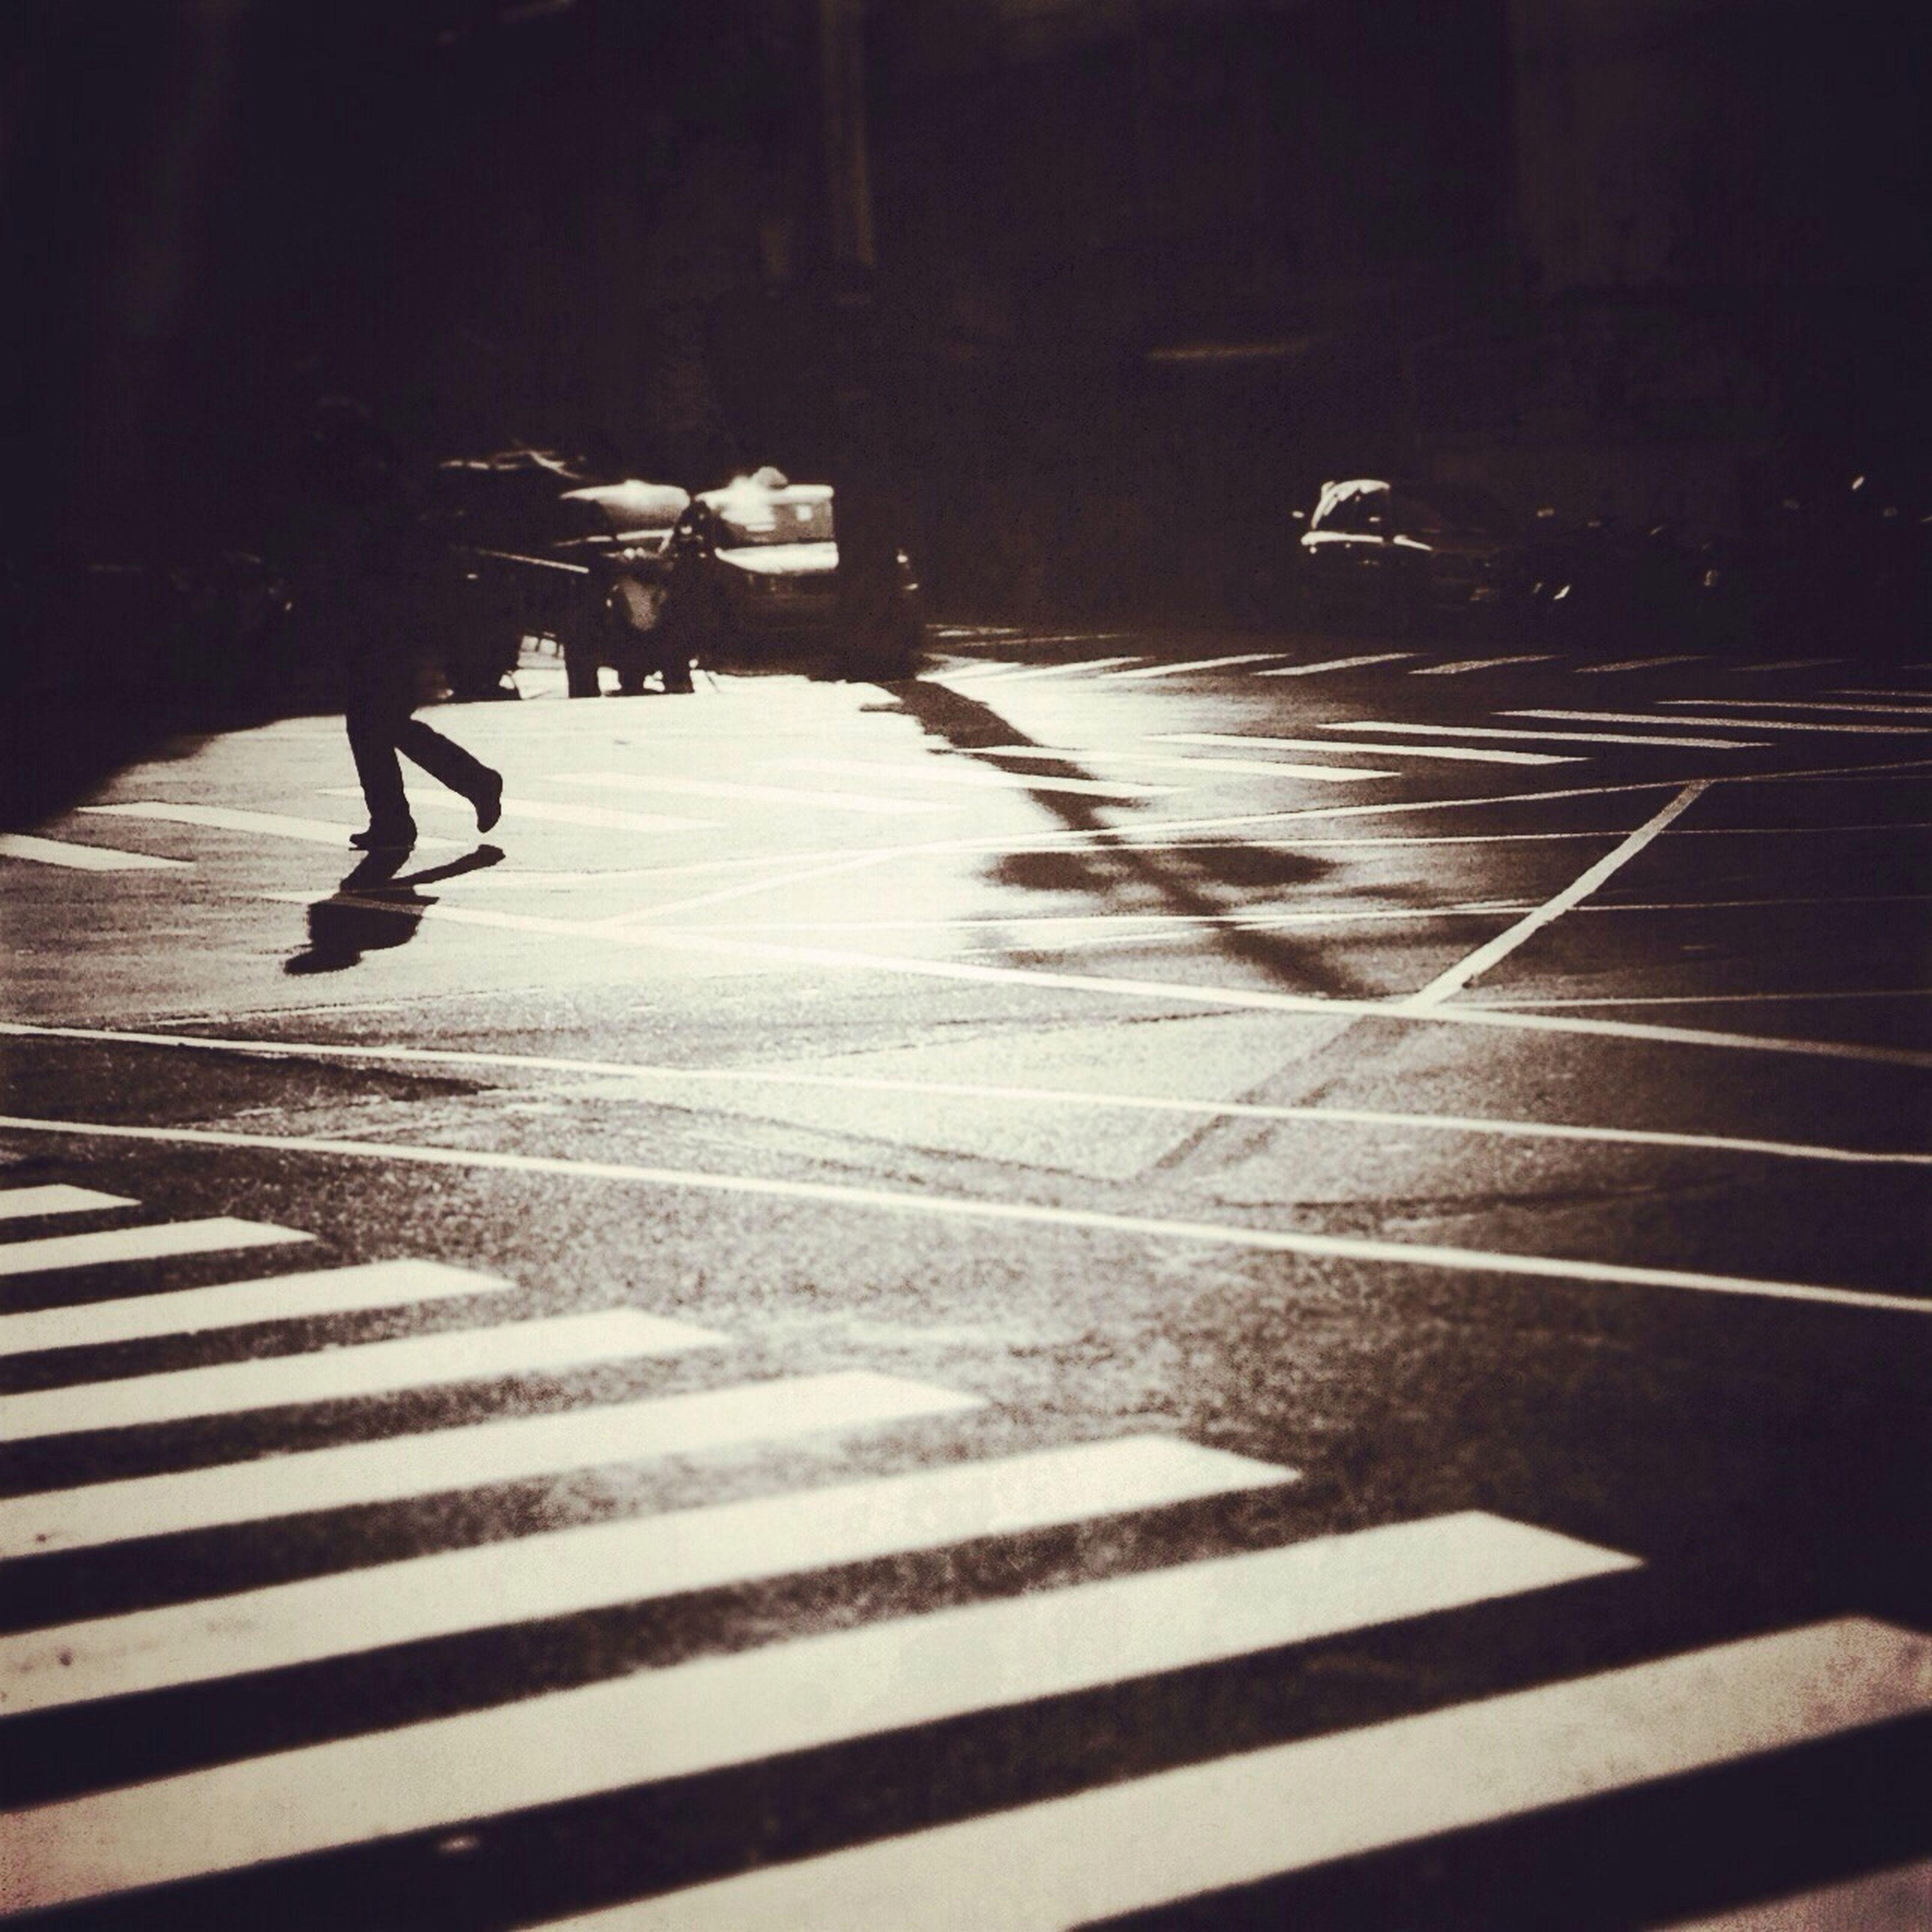 shadow, street, transportation, walking, road marking, sunlight, lifestyles, road, men, city life, on the move, leisure activity, zebra crossing, city, person, full length, the way forward, sidewalk